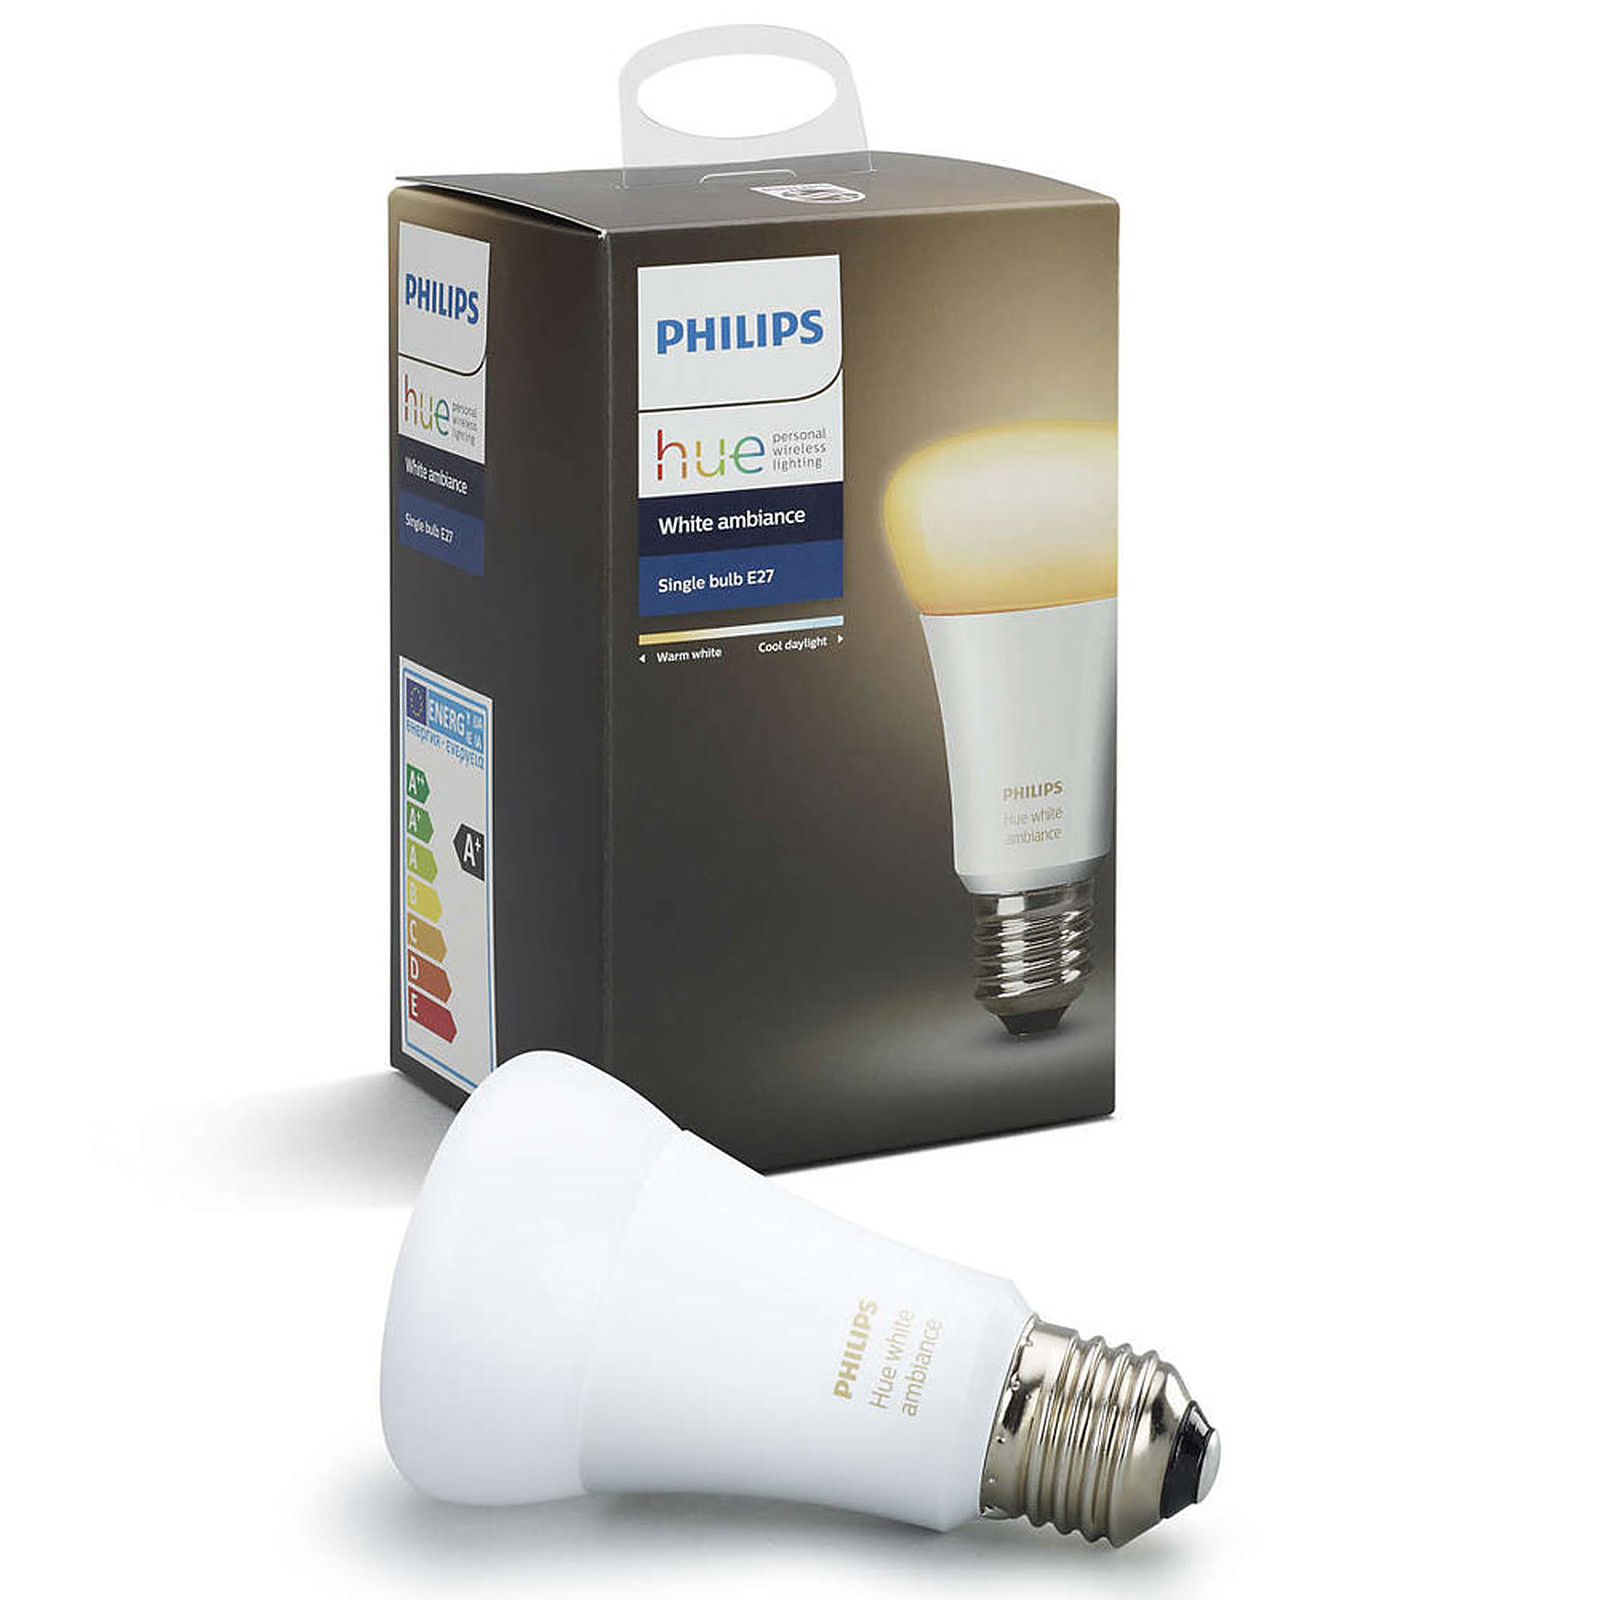 philips hue white ambiance e27 ampoule connect e philips. Black Bedroom Furniture Sets. Home Design Ideas